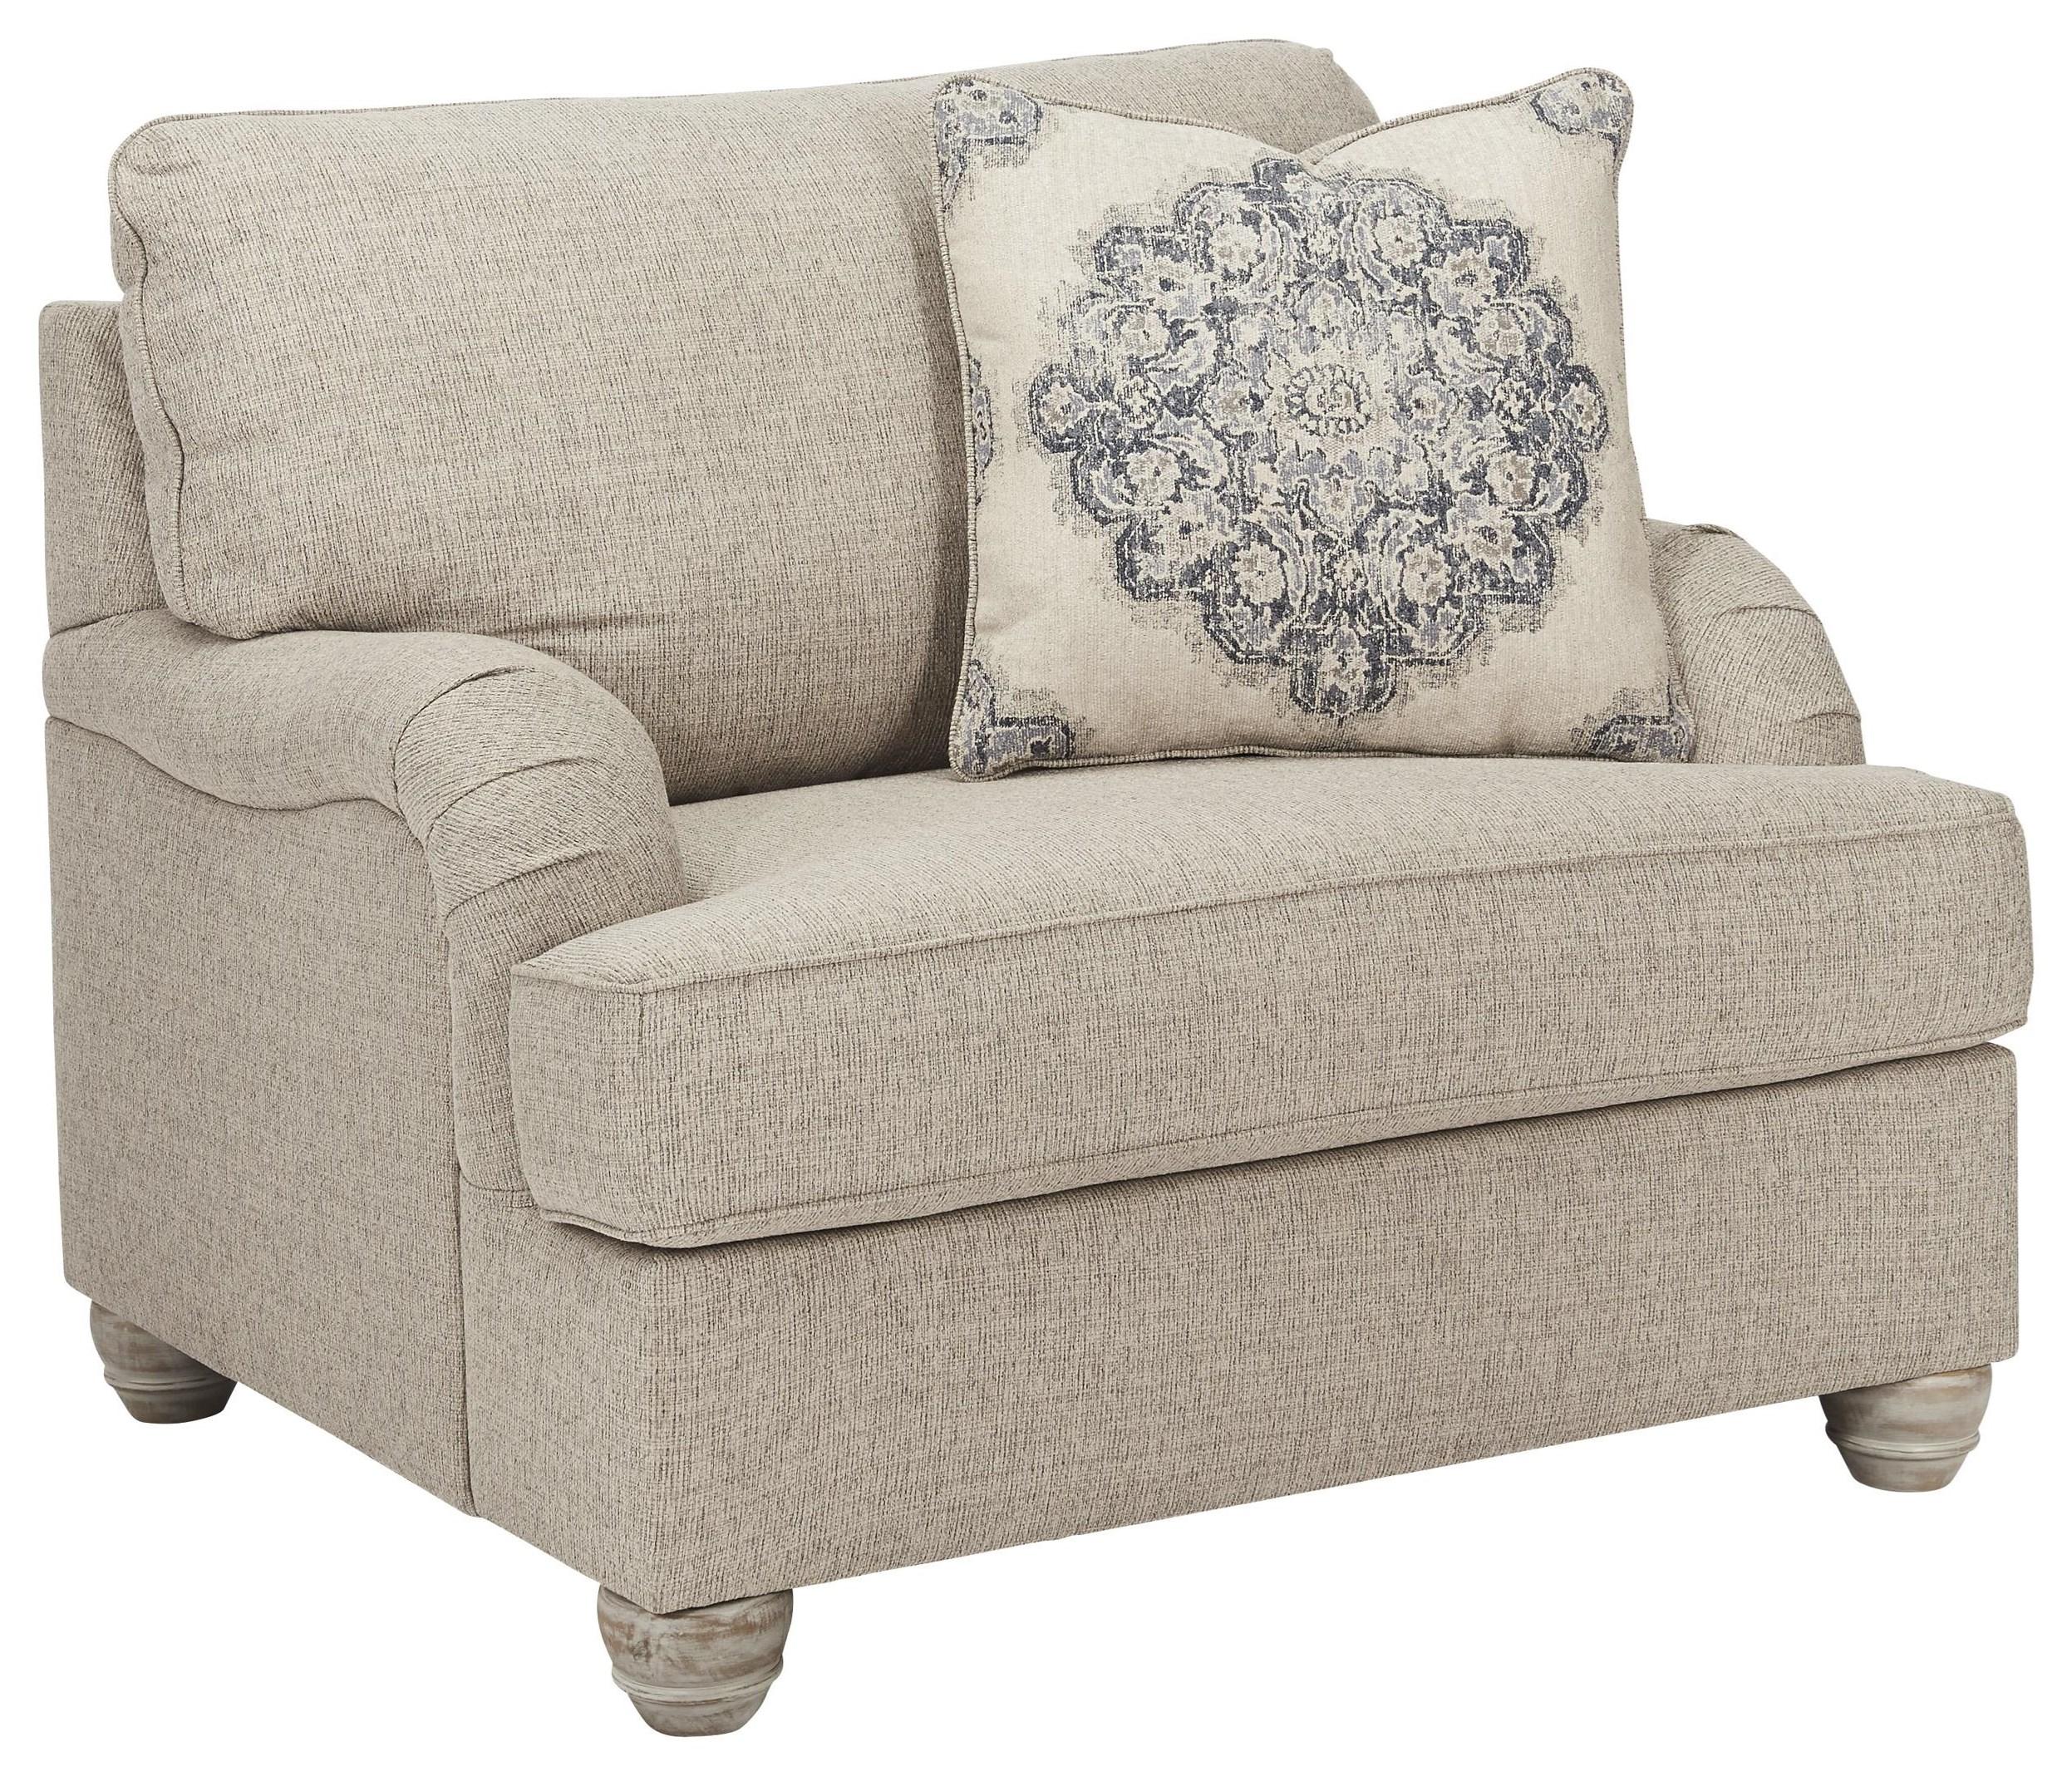 Dandrea Chair and a Half by Ashley Furniture at Sam Levitz Furniture